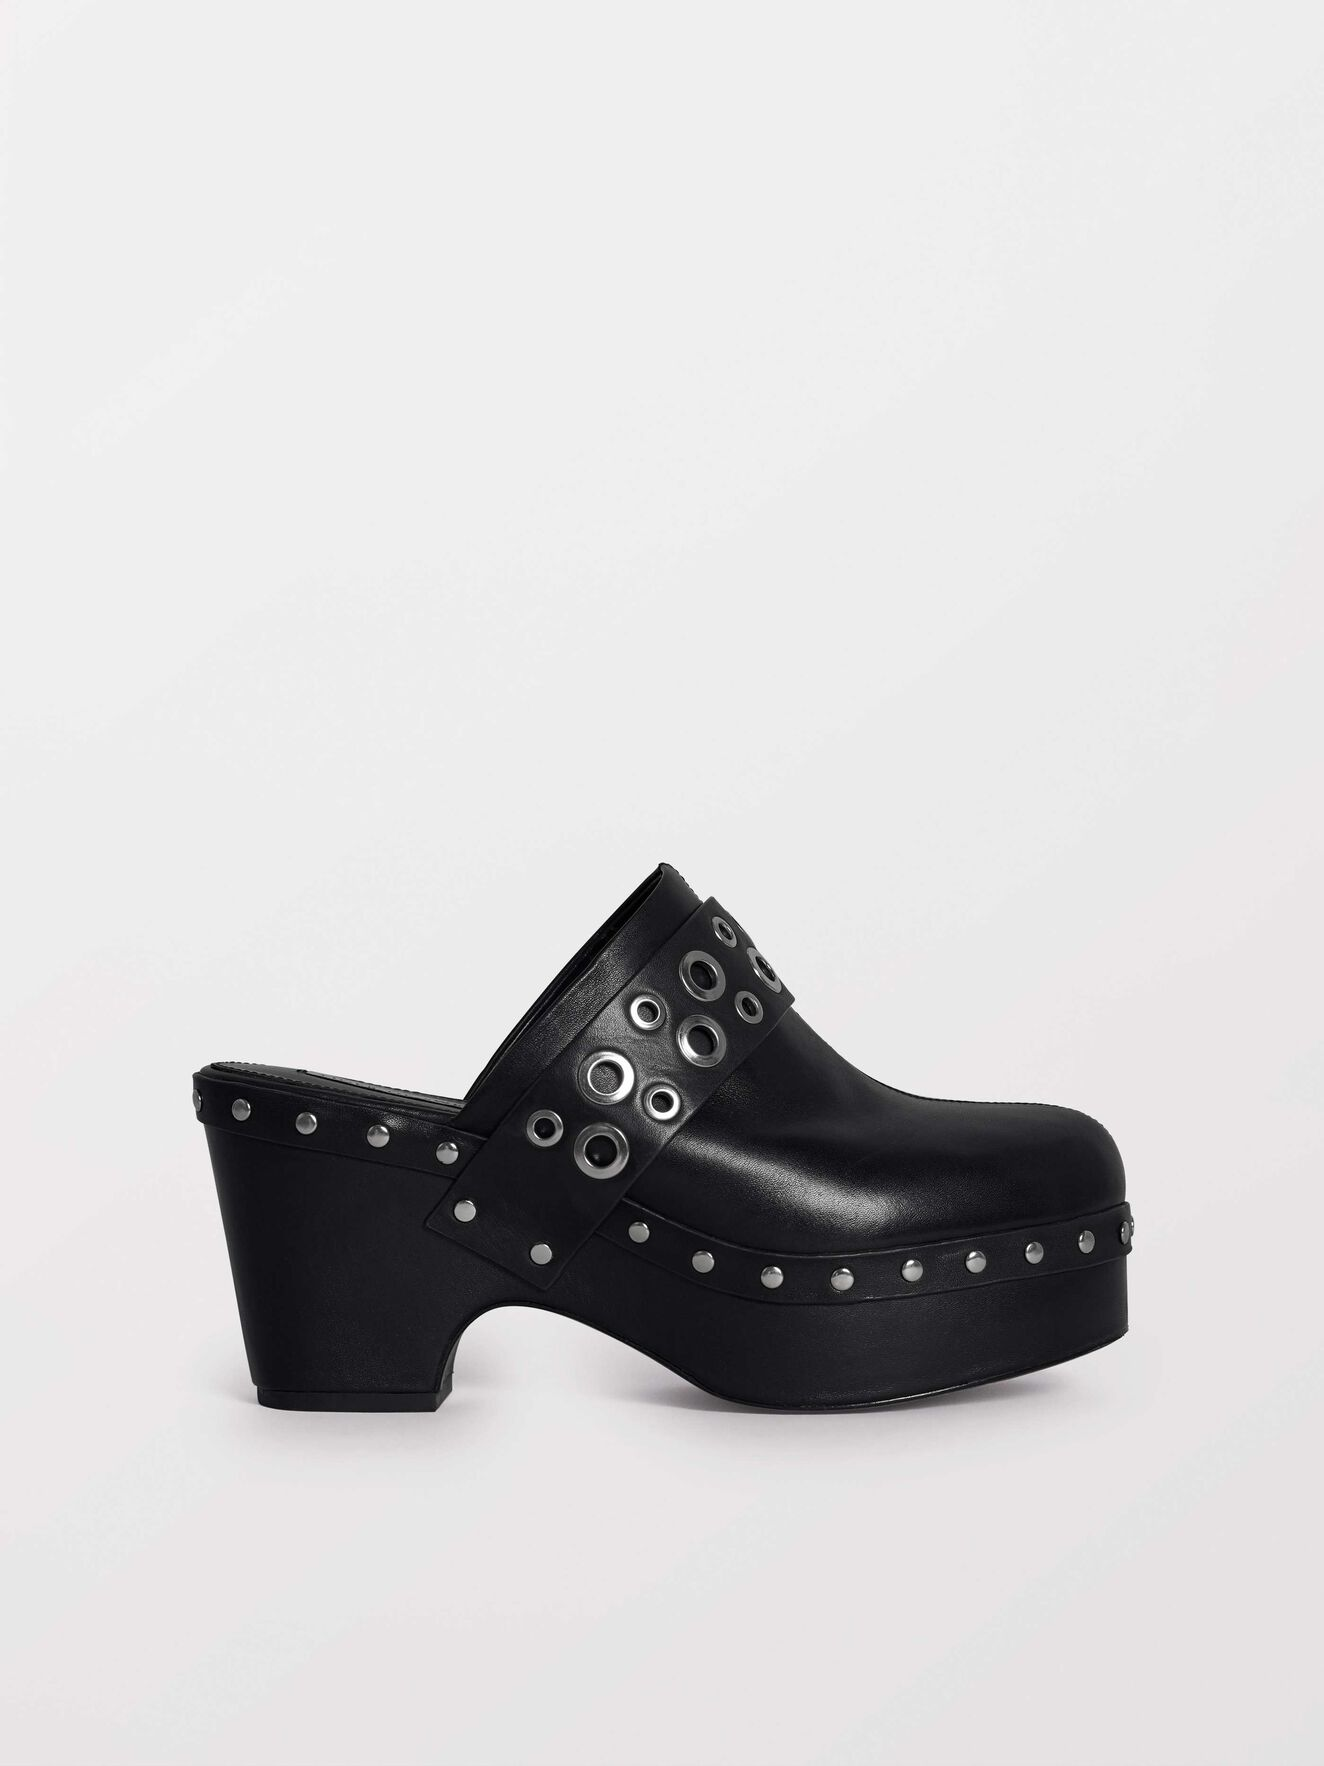 Snoccoli Schuh in Black from Tiger of Sweden